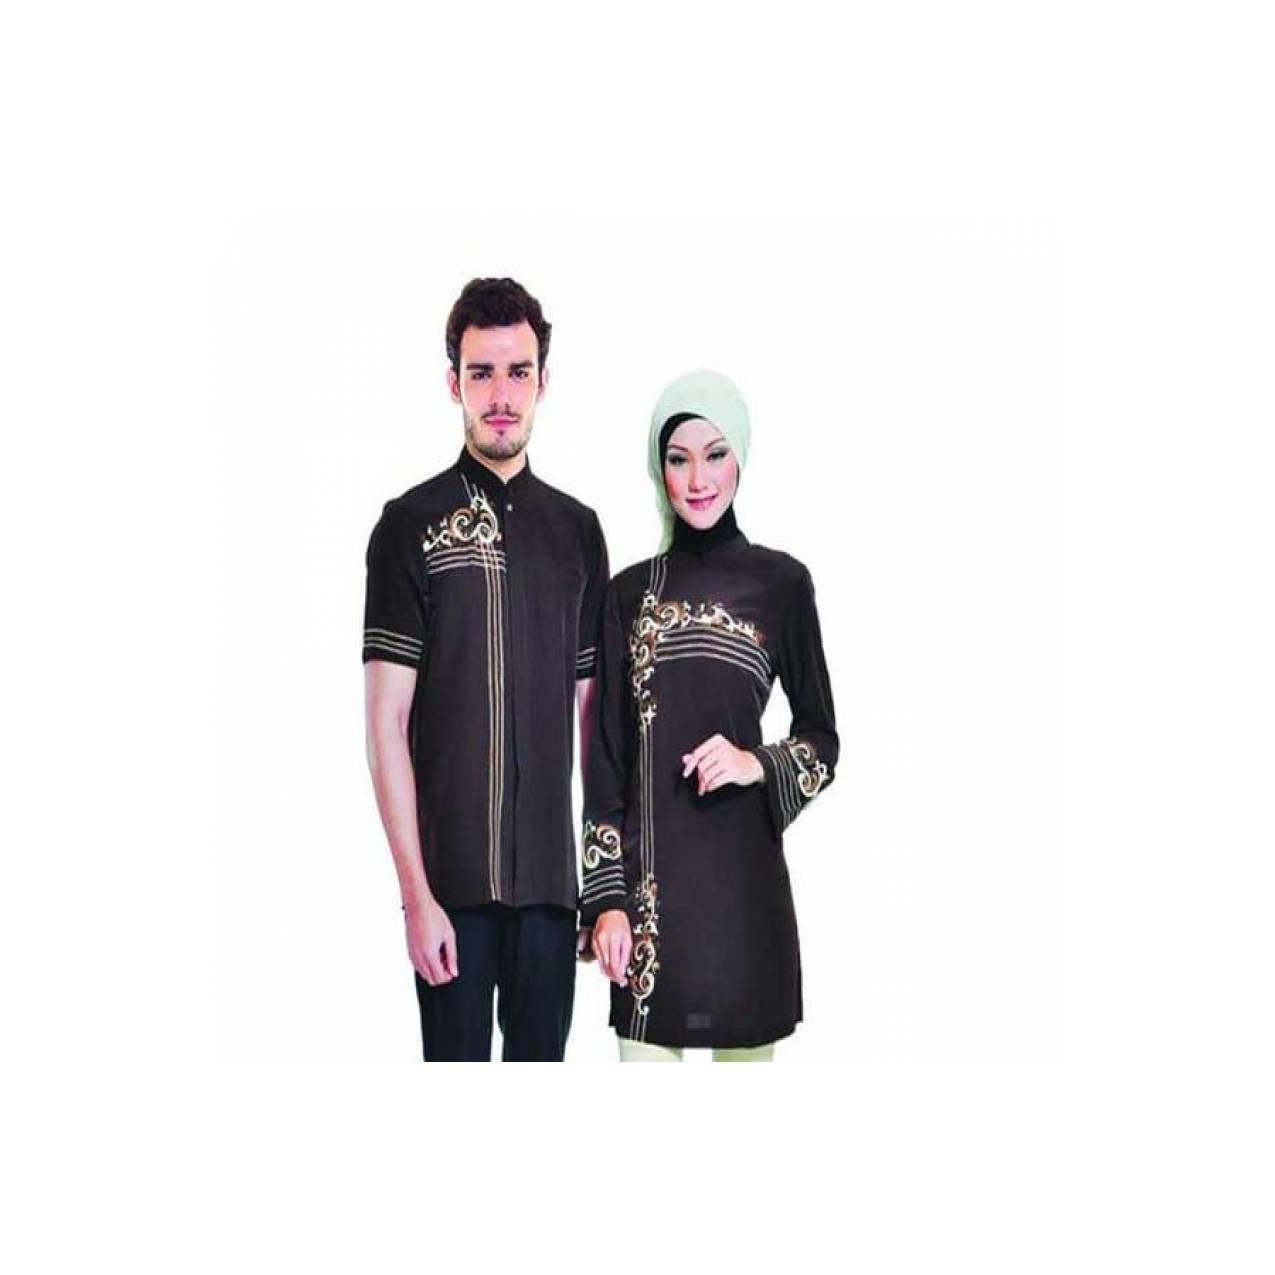 PROMO SPESIAL baju muslim couple terbaru / baju muslim pasangan modis